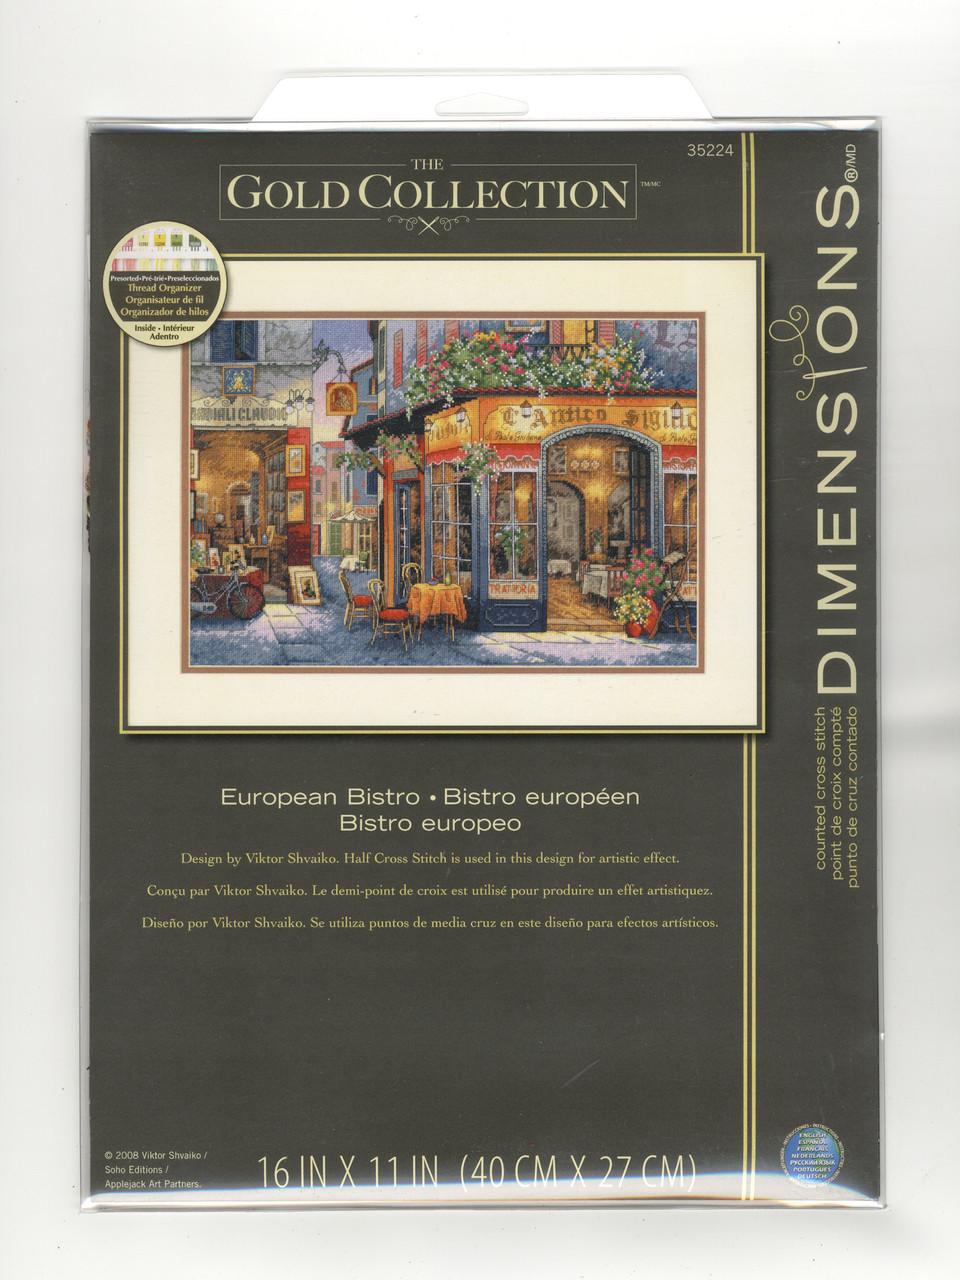 Gold Collection - European Bistro